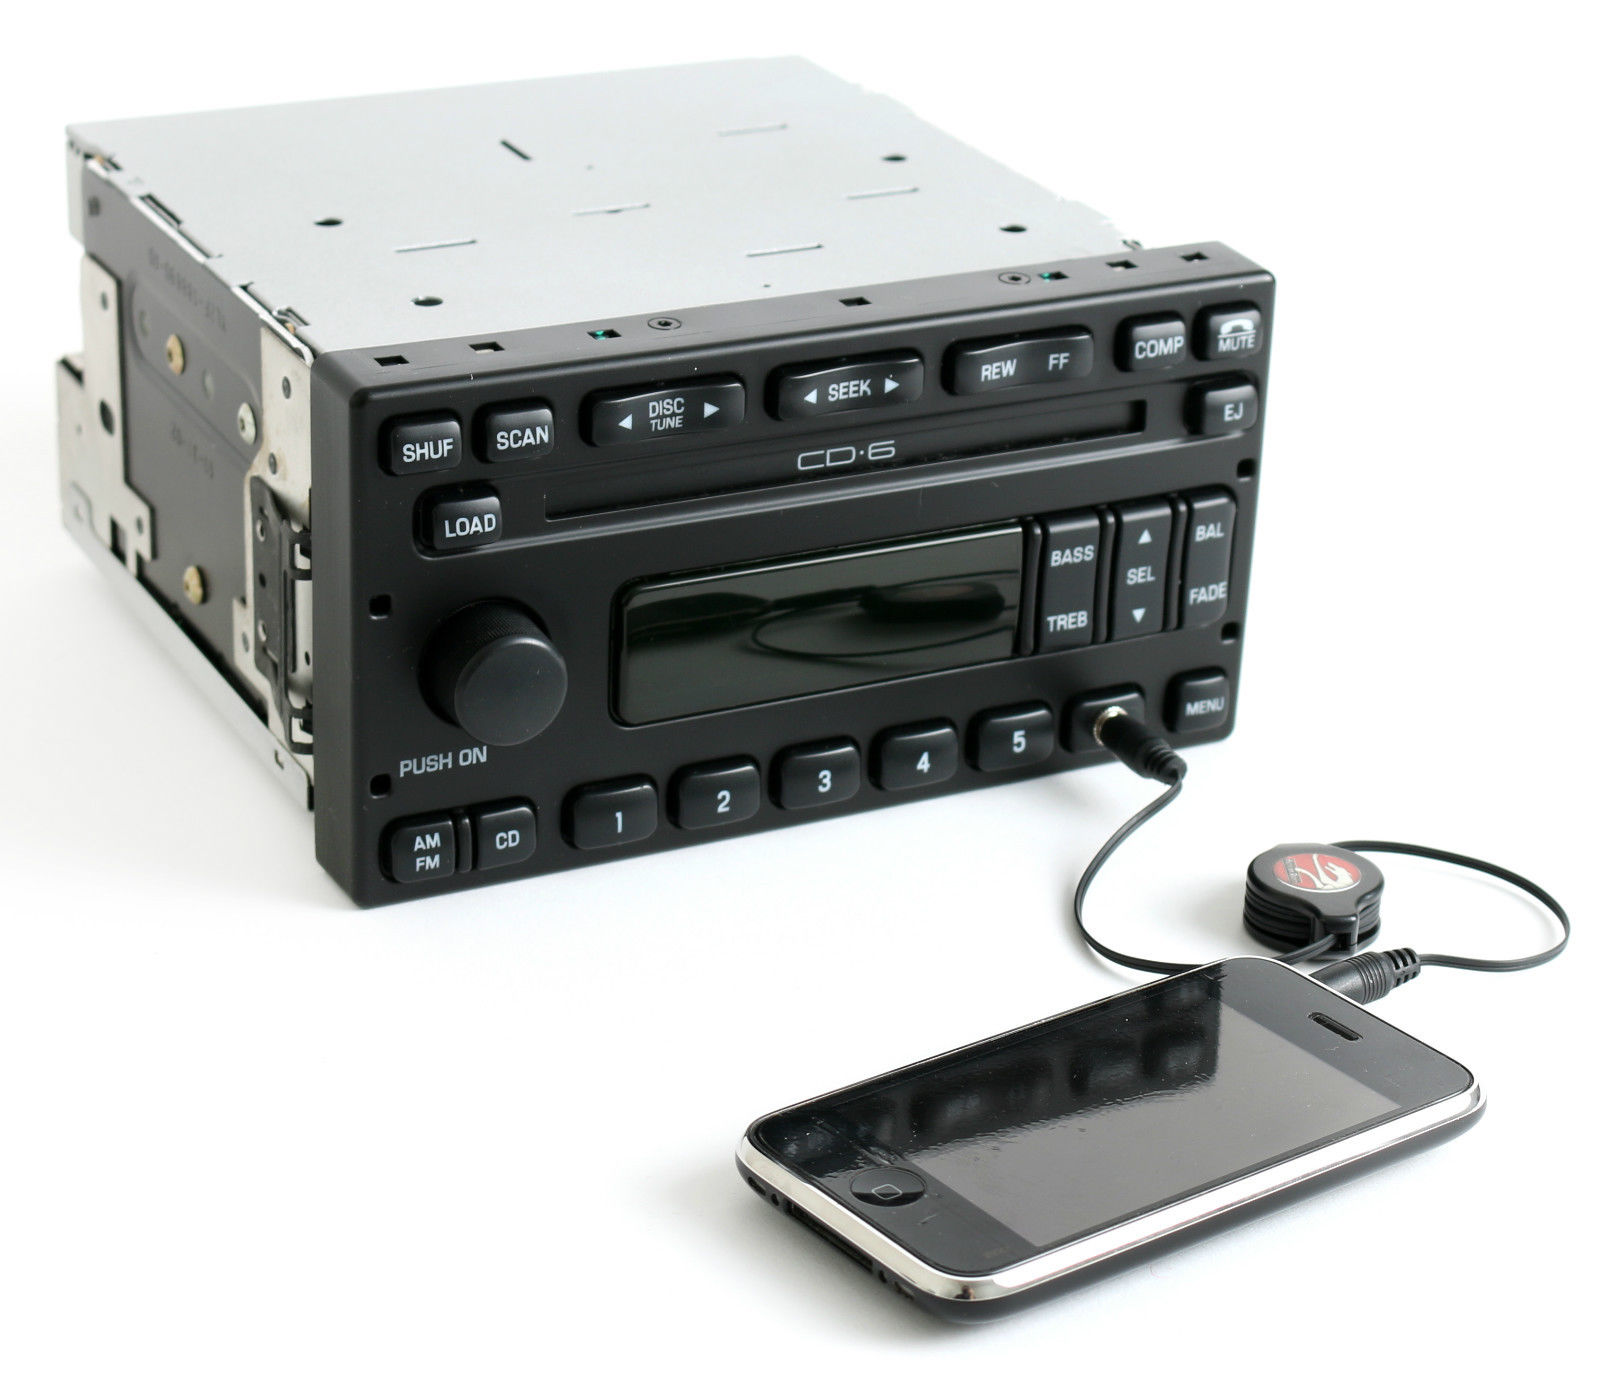 Ford Escape 2003-04 Audiophile Radio AM FM 6 Disc CD w Aux Input  3L8T-18C815-AC - 1 Factory Radio